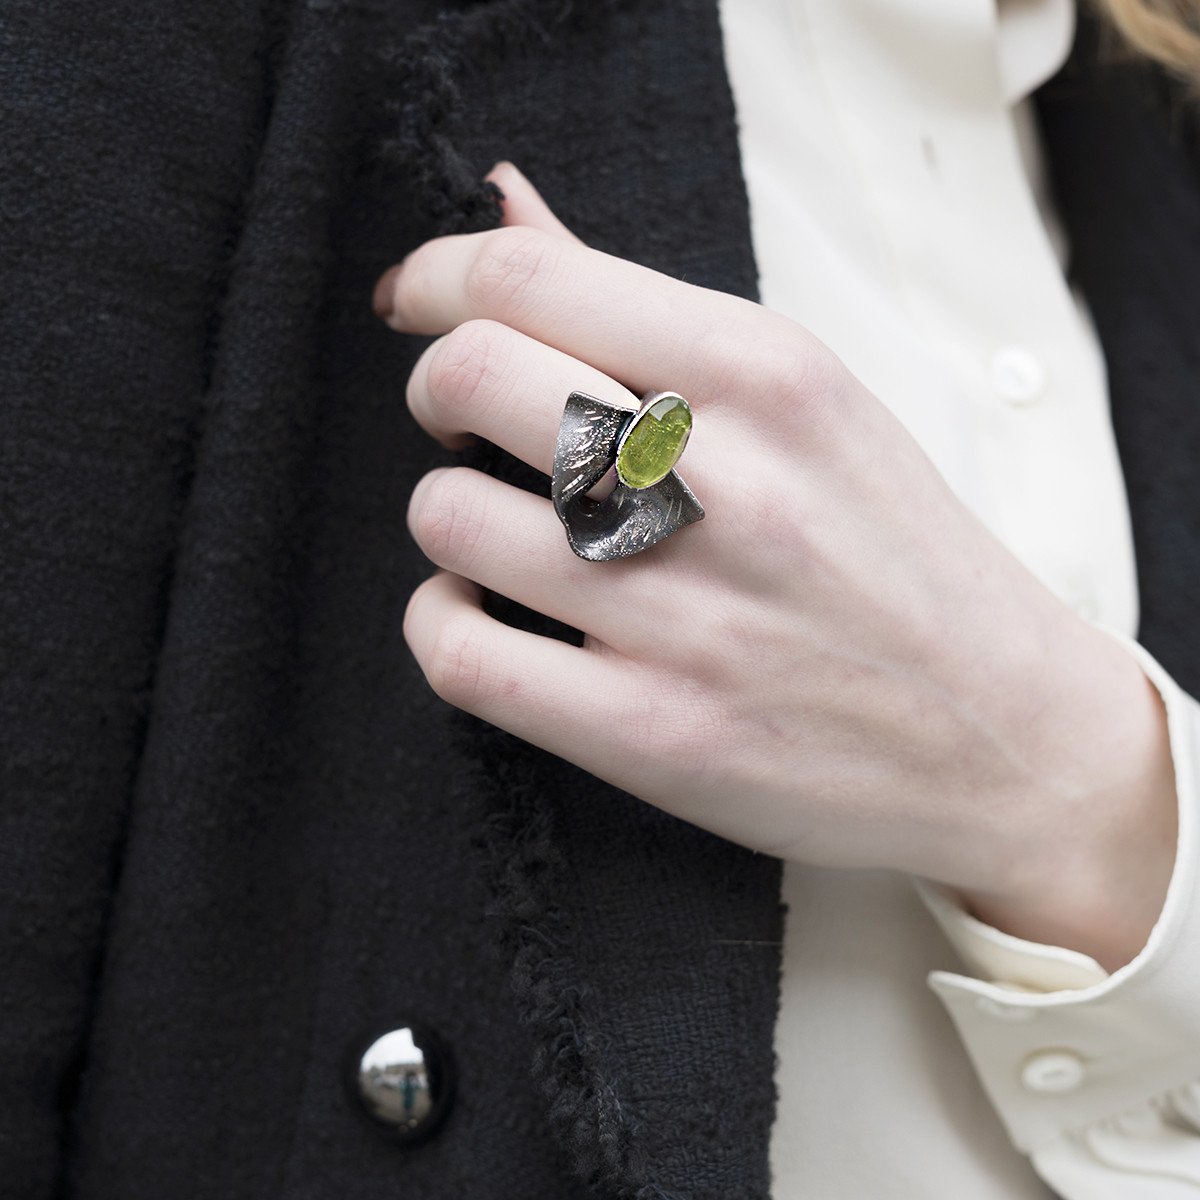 d34c5d57b Loading zoom.  Tina_Kotsoni_handmade_jewellery_oxidised_silver_peridot_green_stone_unique_different_eye_catching_ring